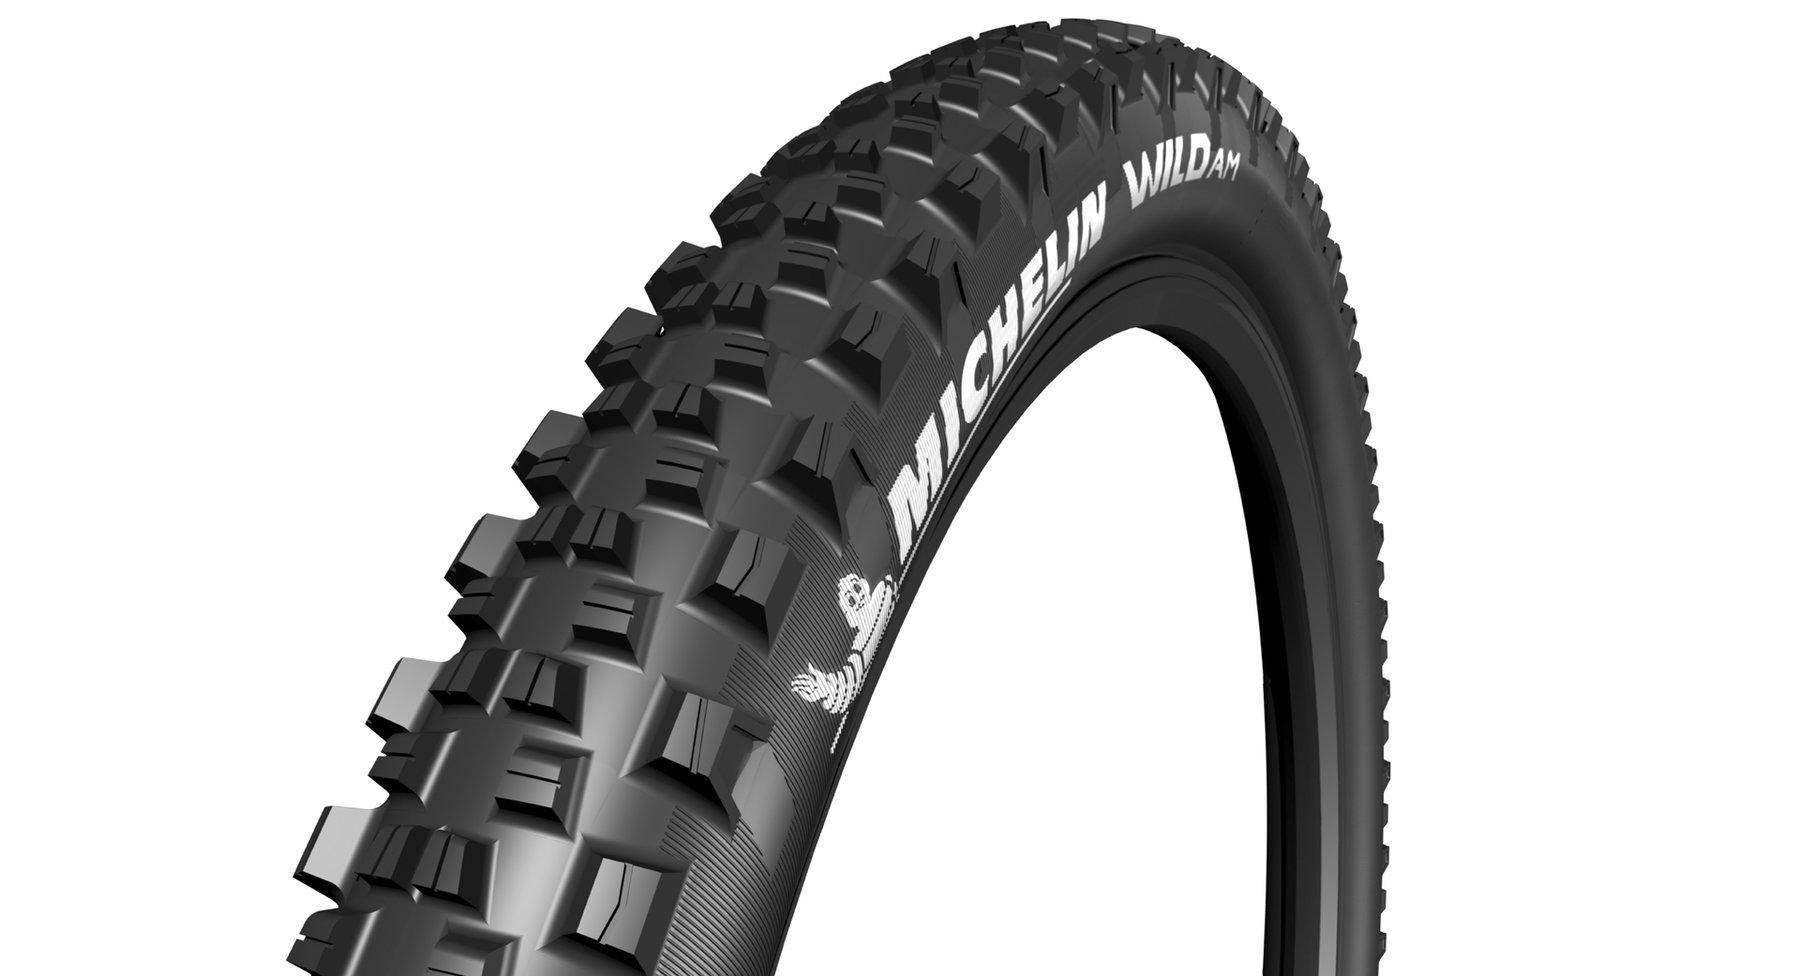 Plášť Michelin 27.5X2.35 WILD AM TS TLR